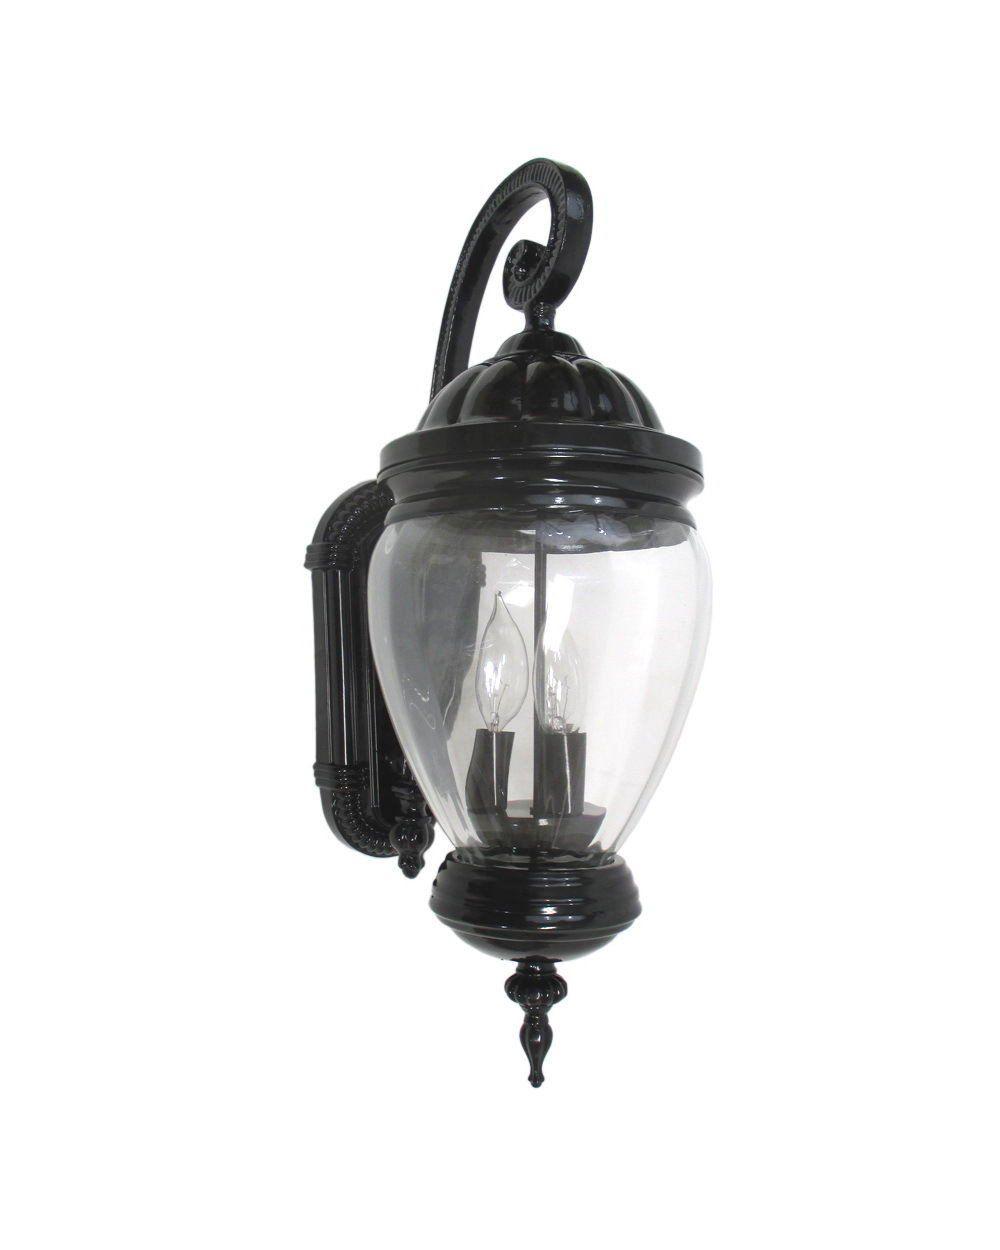 Epiphany Lighting 104973 Bk One Light Cast Aluminum Outdoor Exterior Wall Lantern In Black Finish